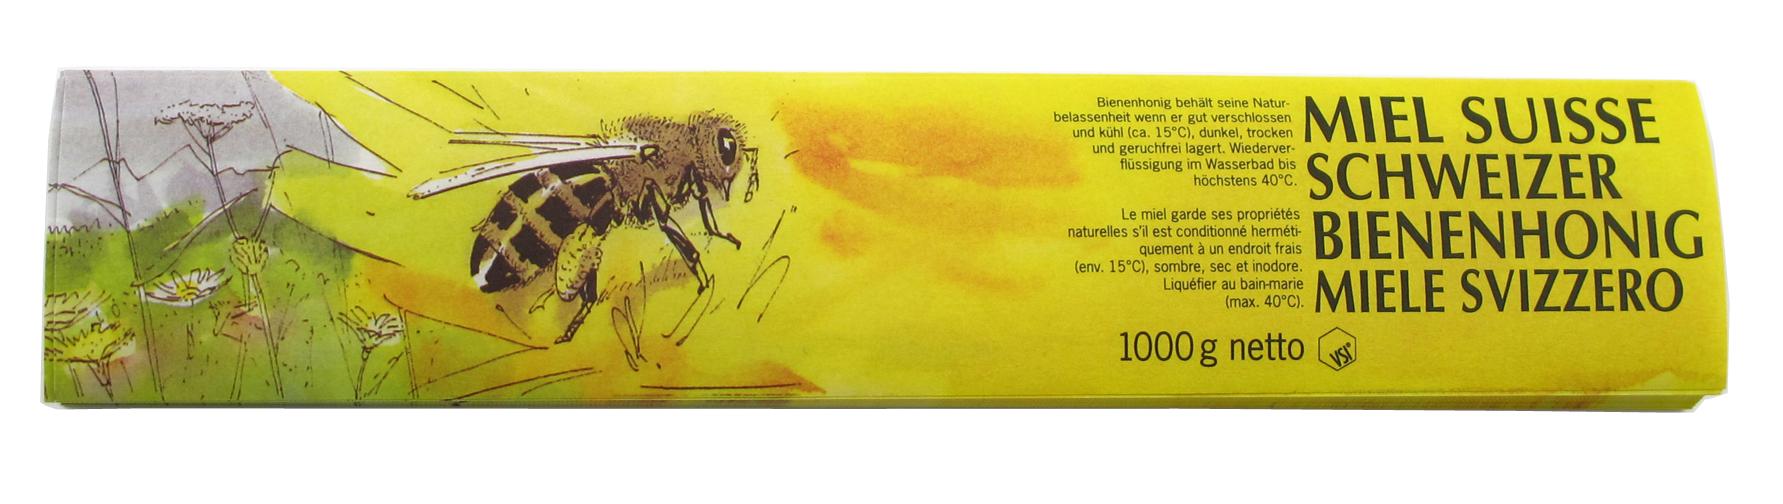 VSI Honig Etiketten 1000 g gelb